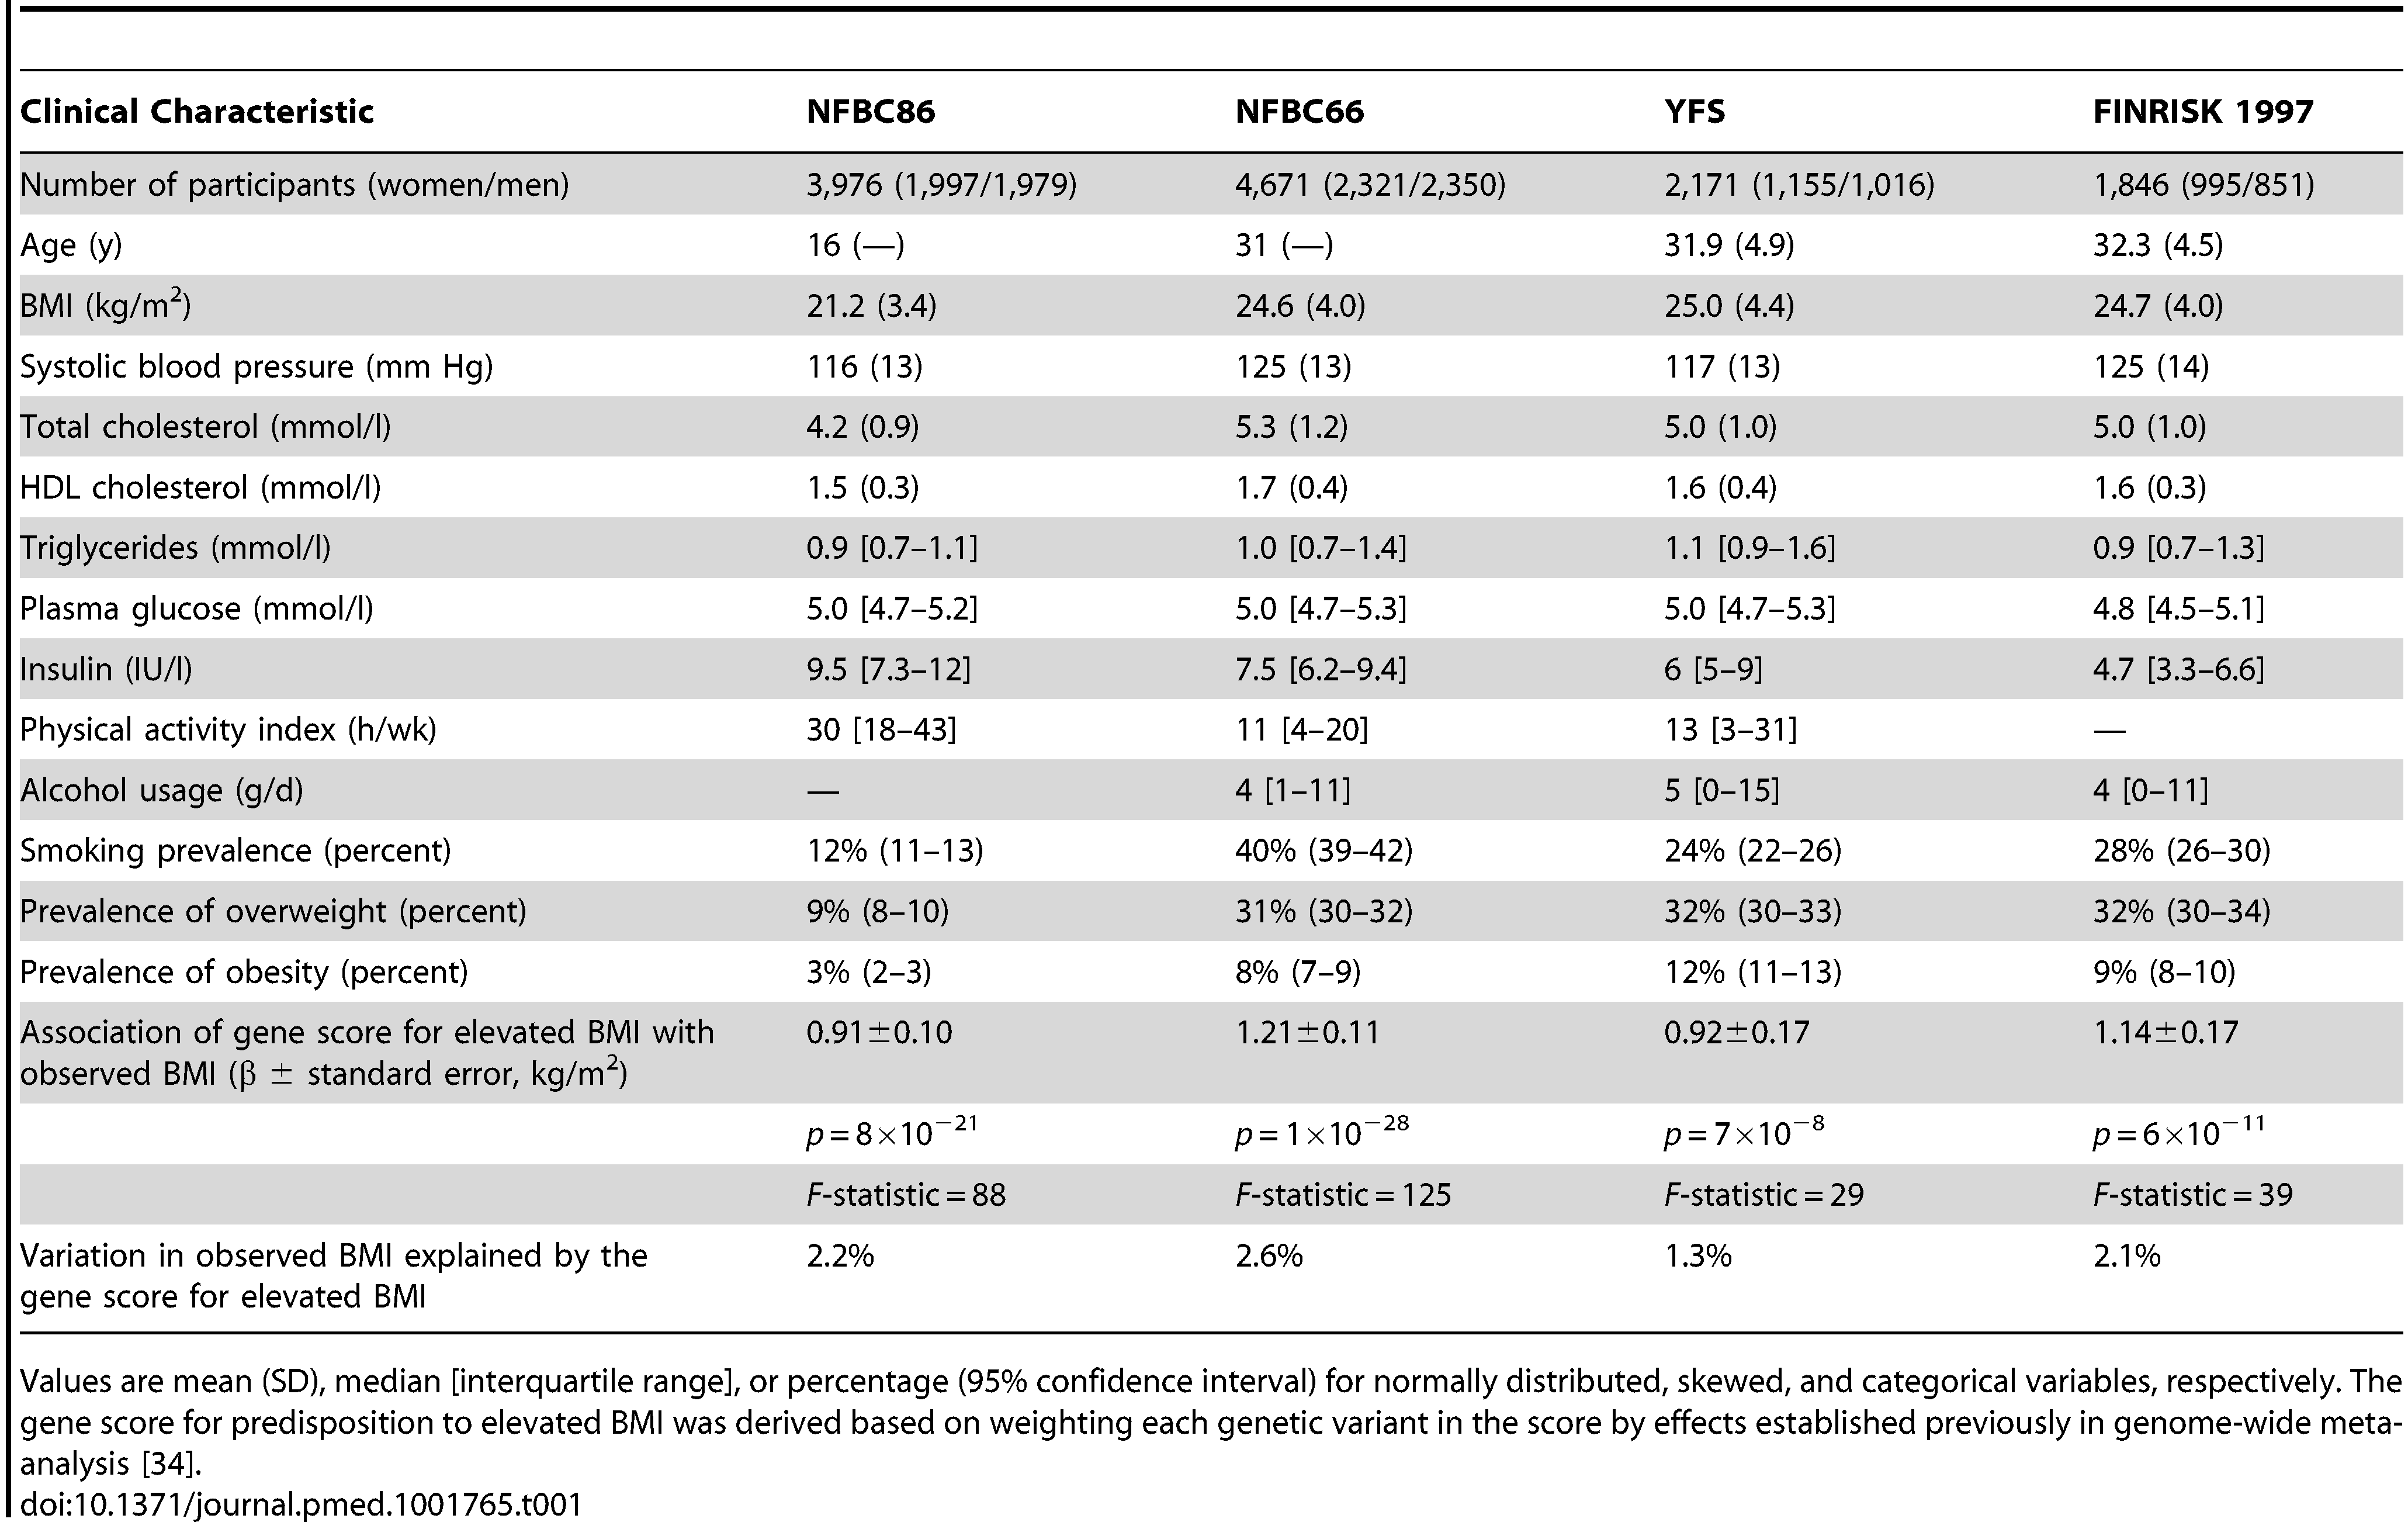 Characteristics of the study populations.